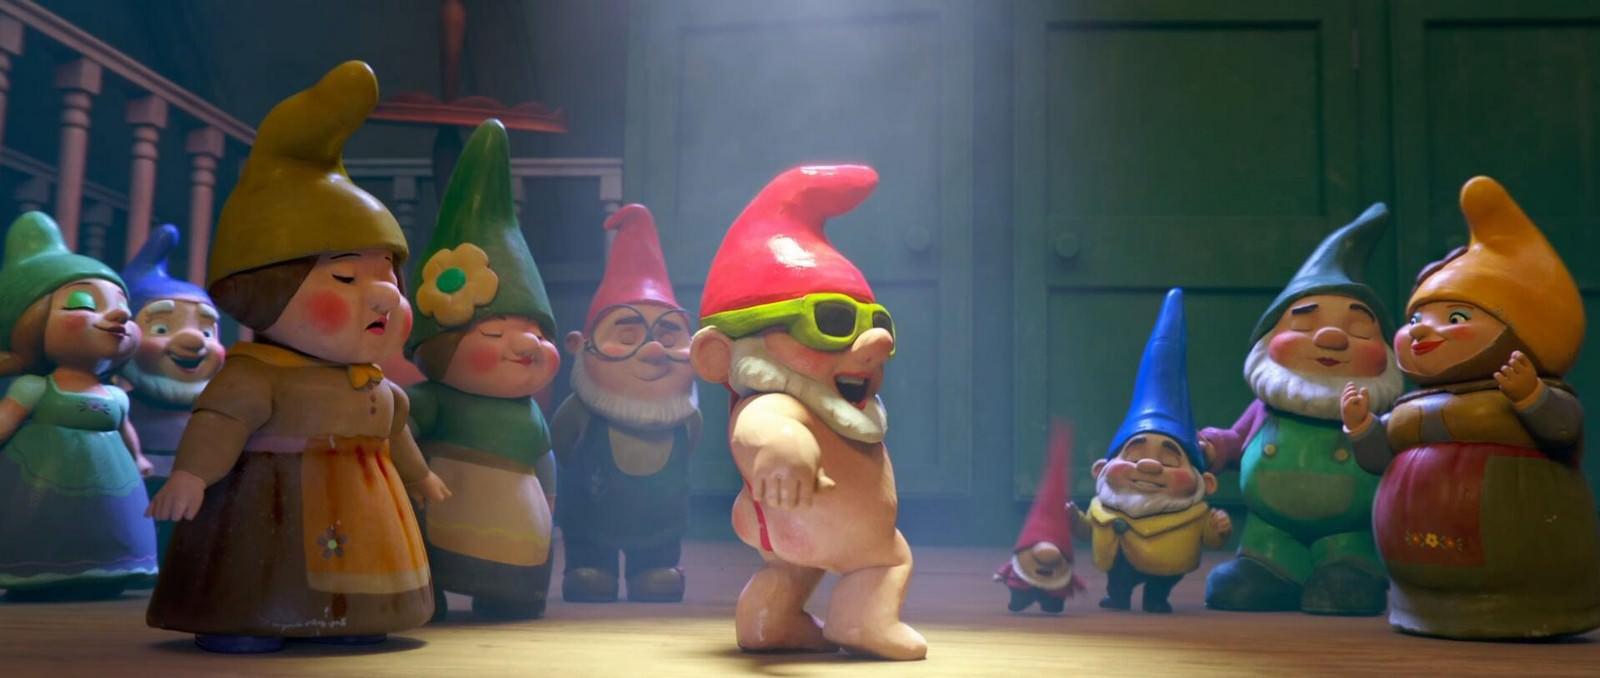 Movie, Sherlock Gnomes(英國.美國) / 糯爾摩斯(台) / 神探福爾摩侏(港) / 吉诺密欧与朱丽叶2:夏洛克·糯尔摩斯(網), 電影劇照